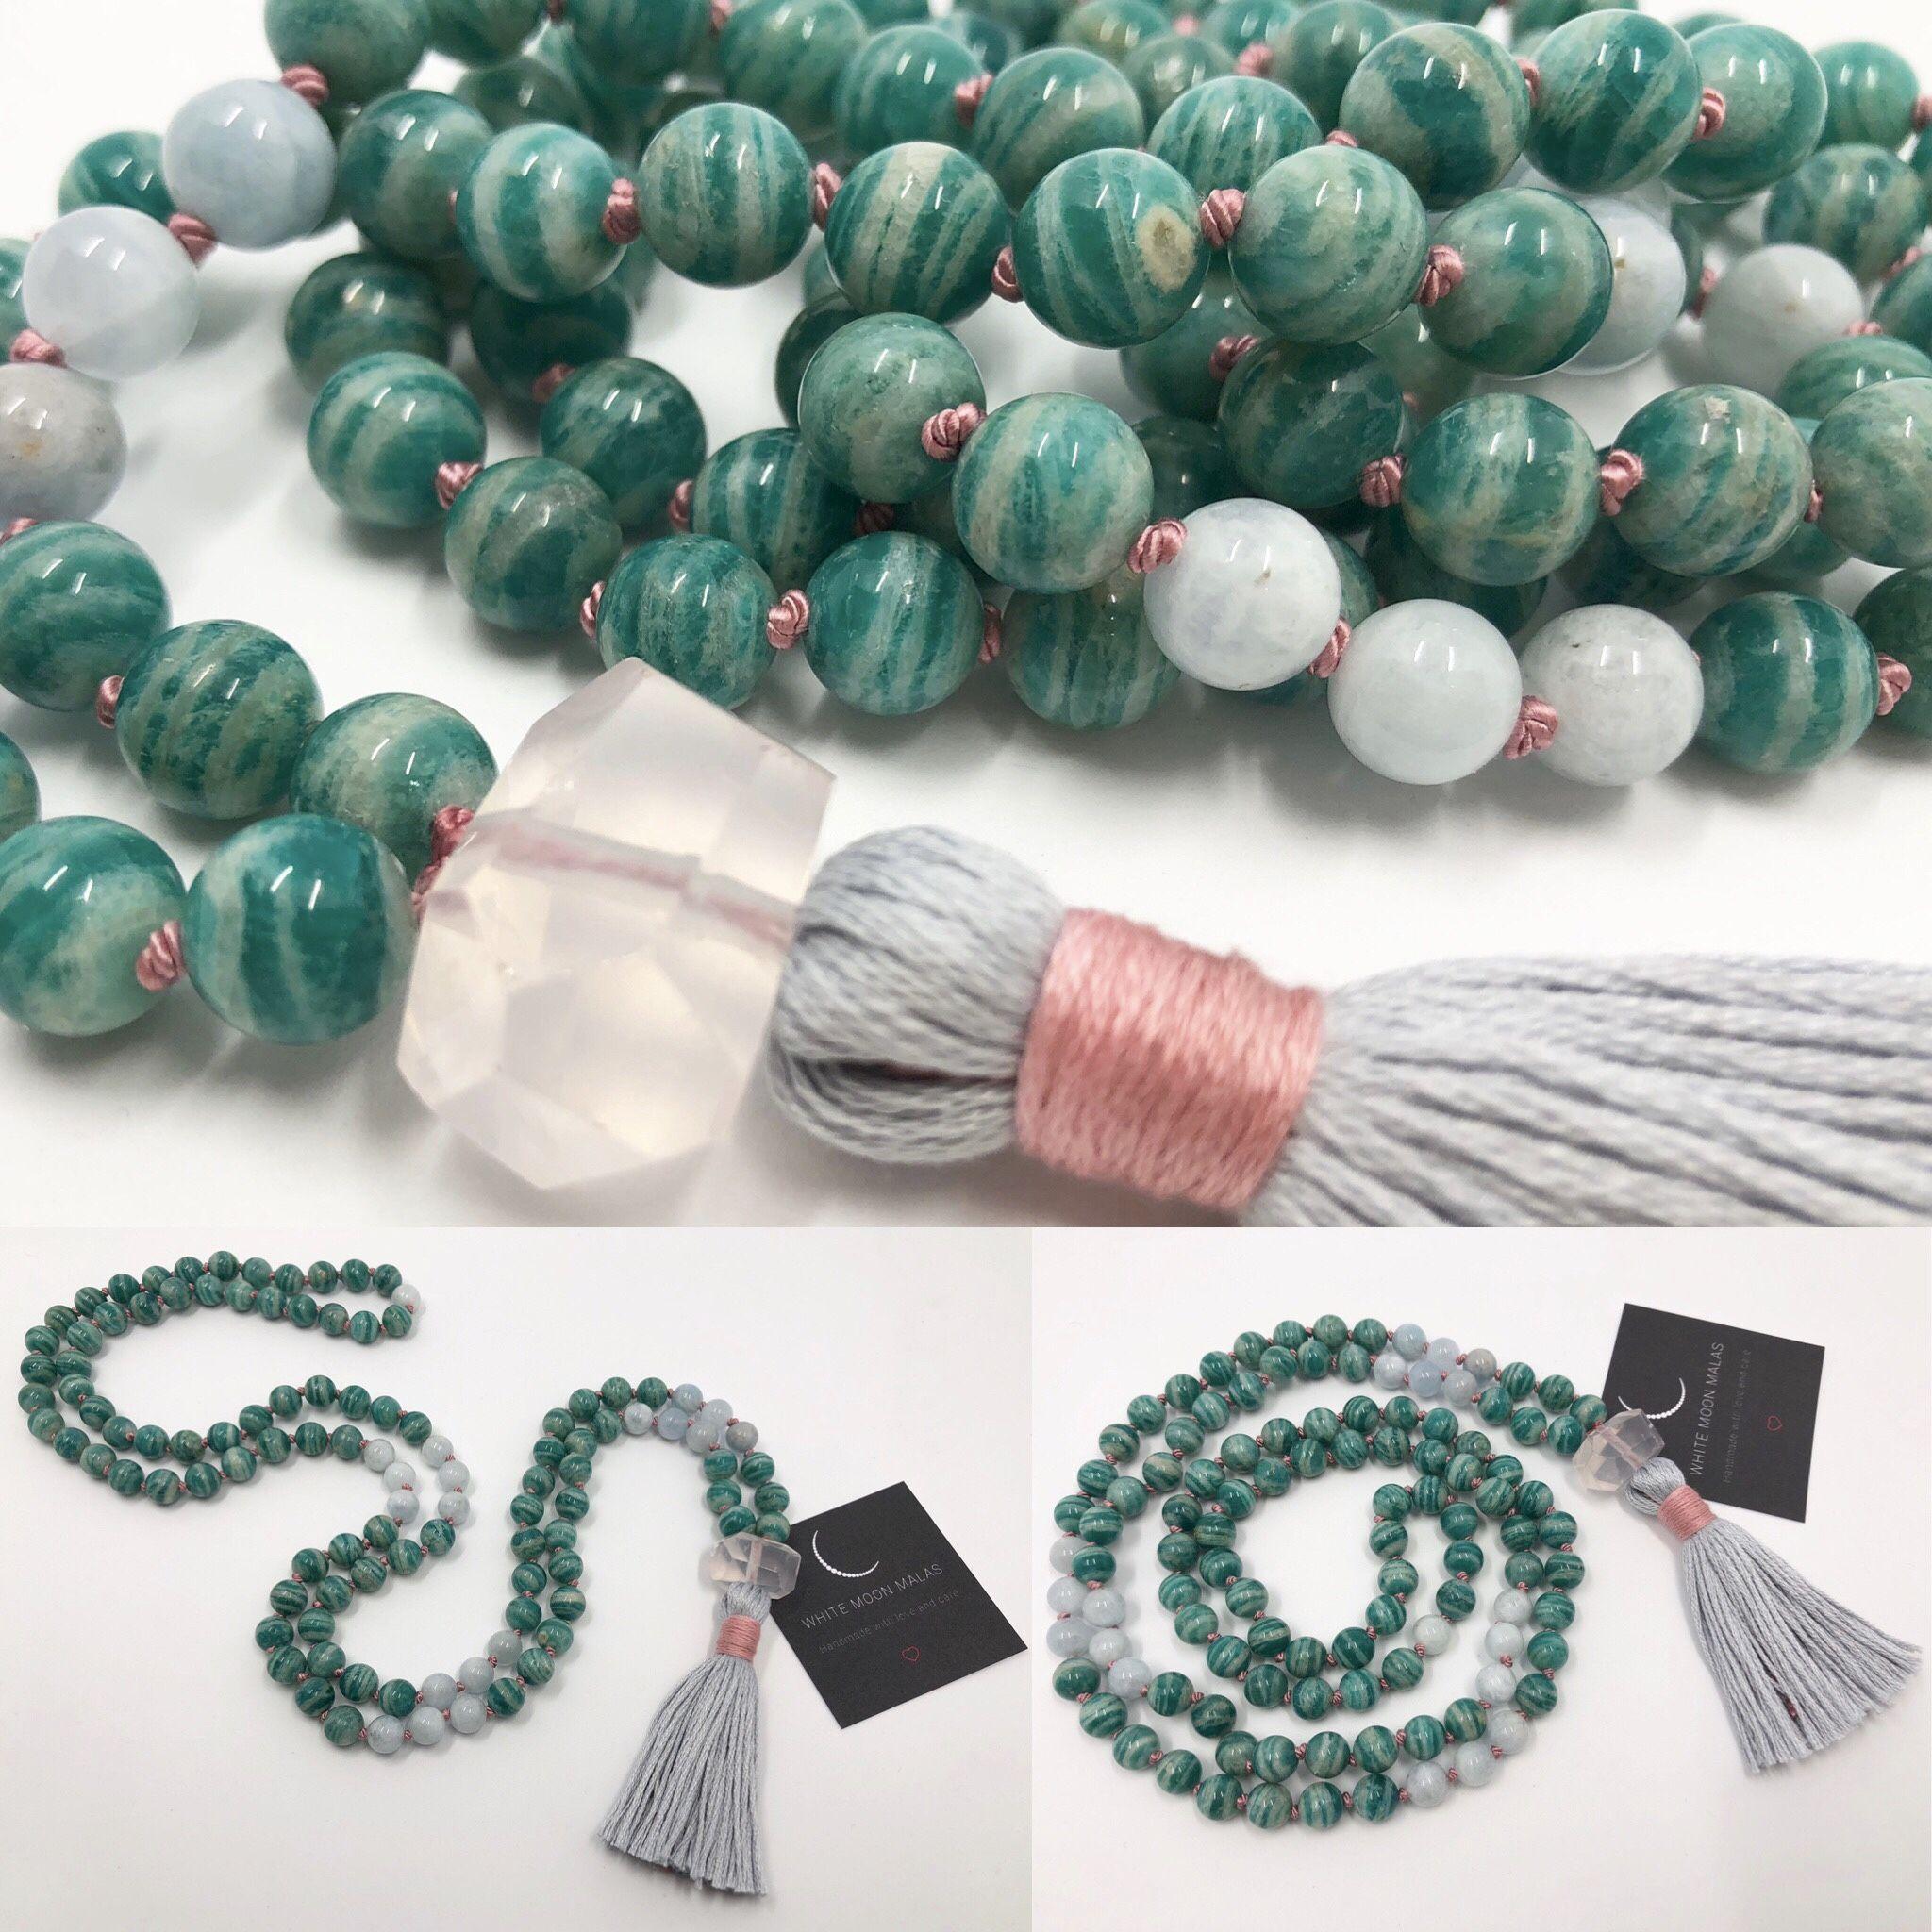 Mala Necklace Made Of Russian Amazonite Aquamarine And Rose